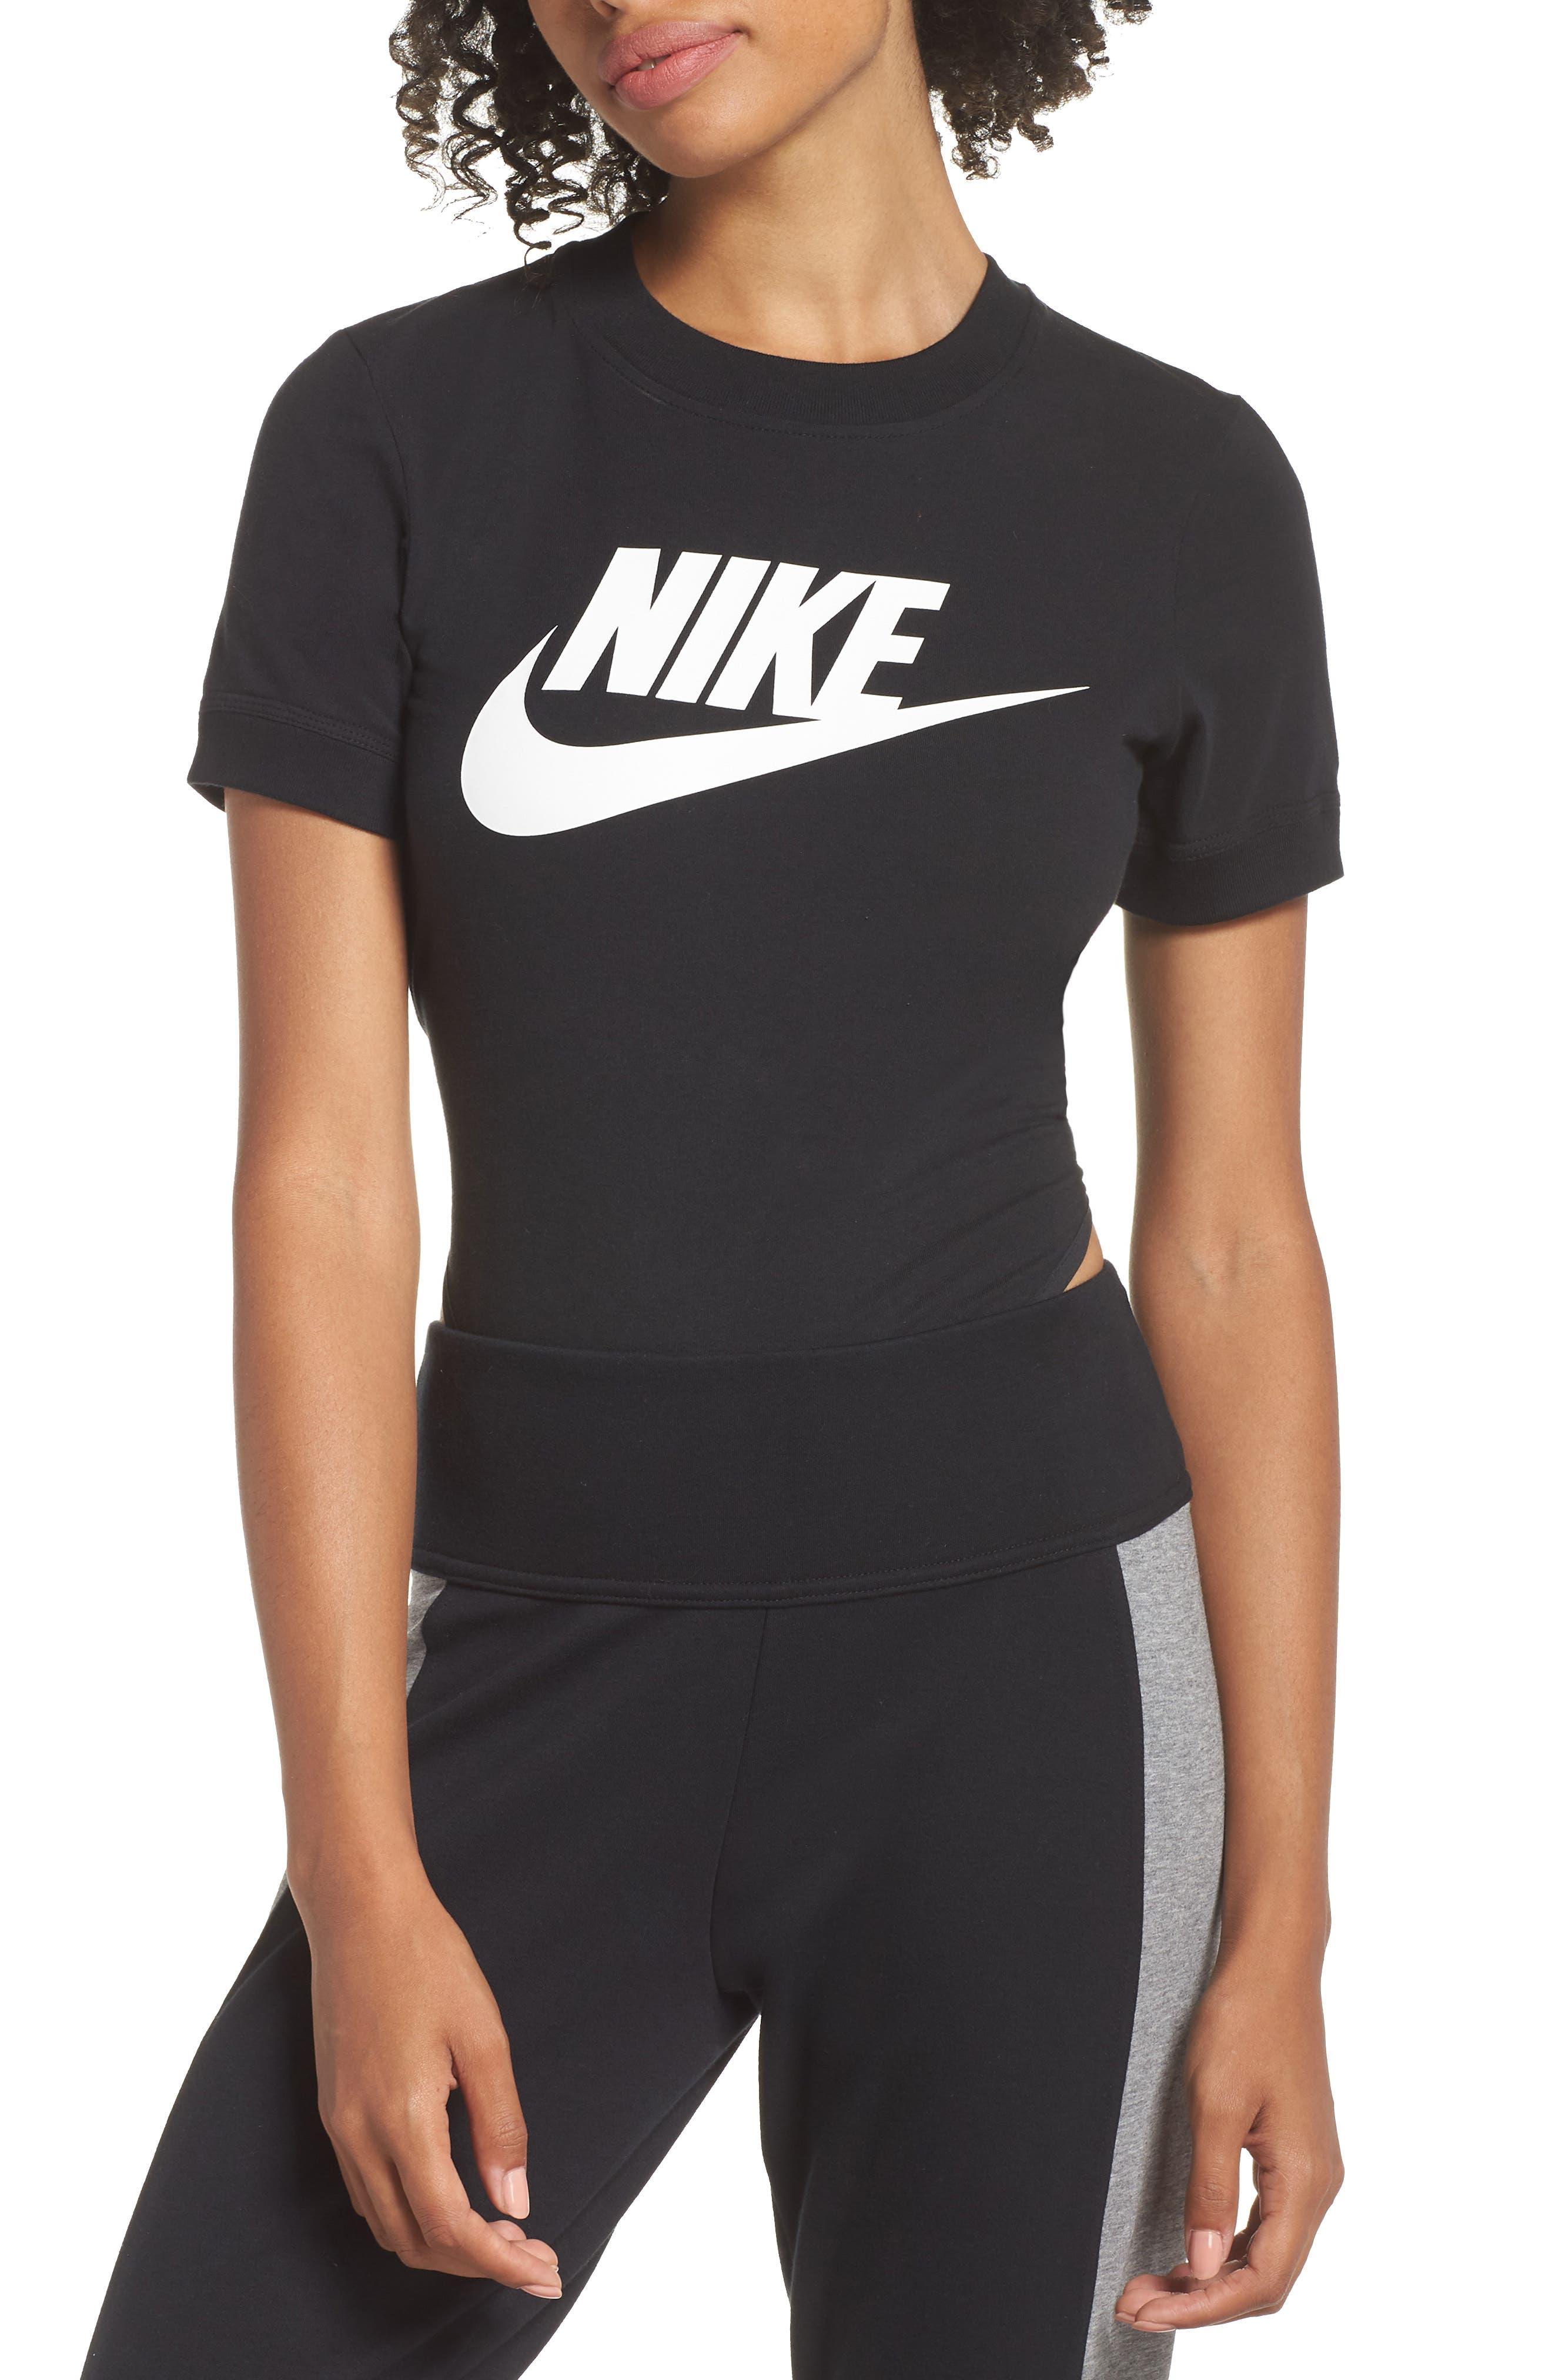 NSW Essential Bodysuit,                             Alternate thumbnail 4, color,                             BLACK/ BLACK/ WHITE